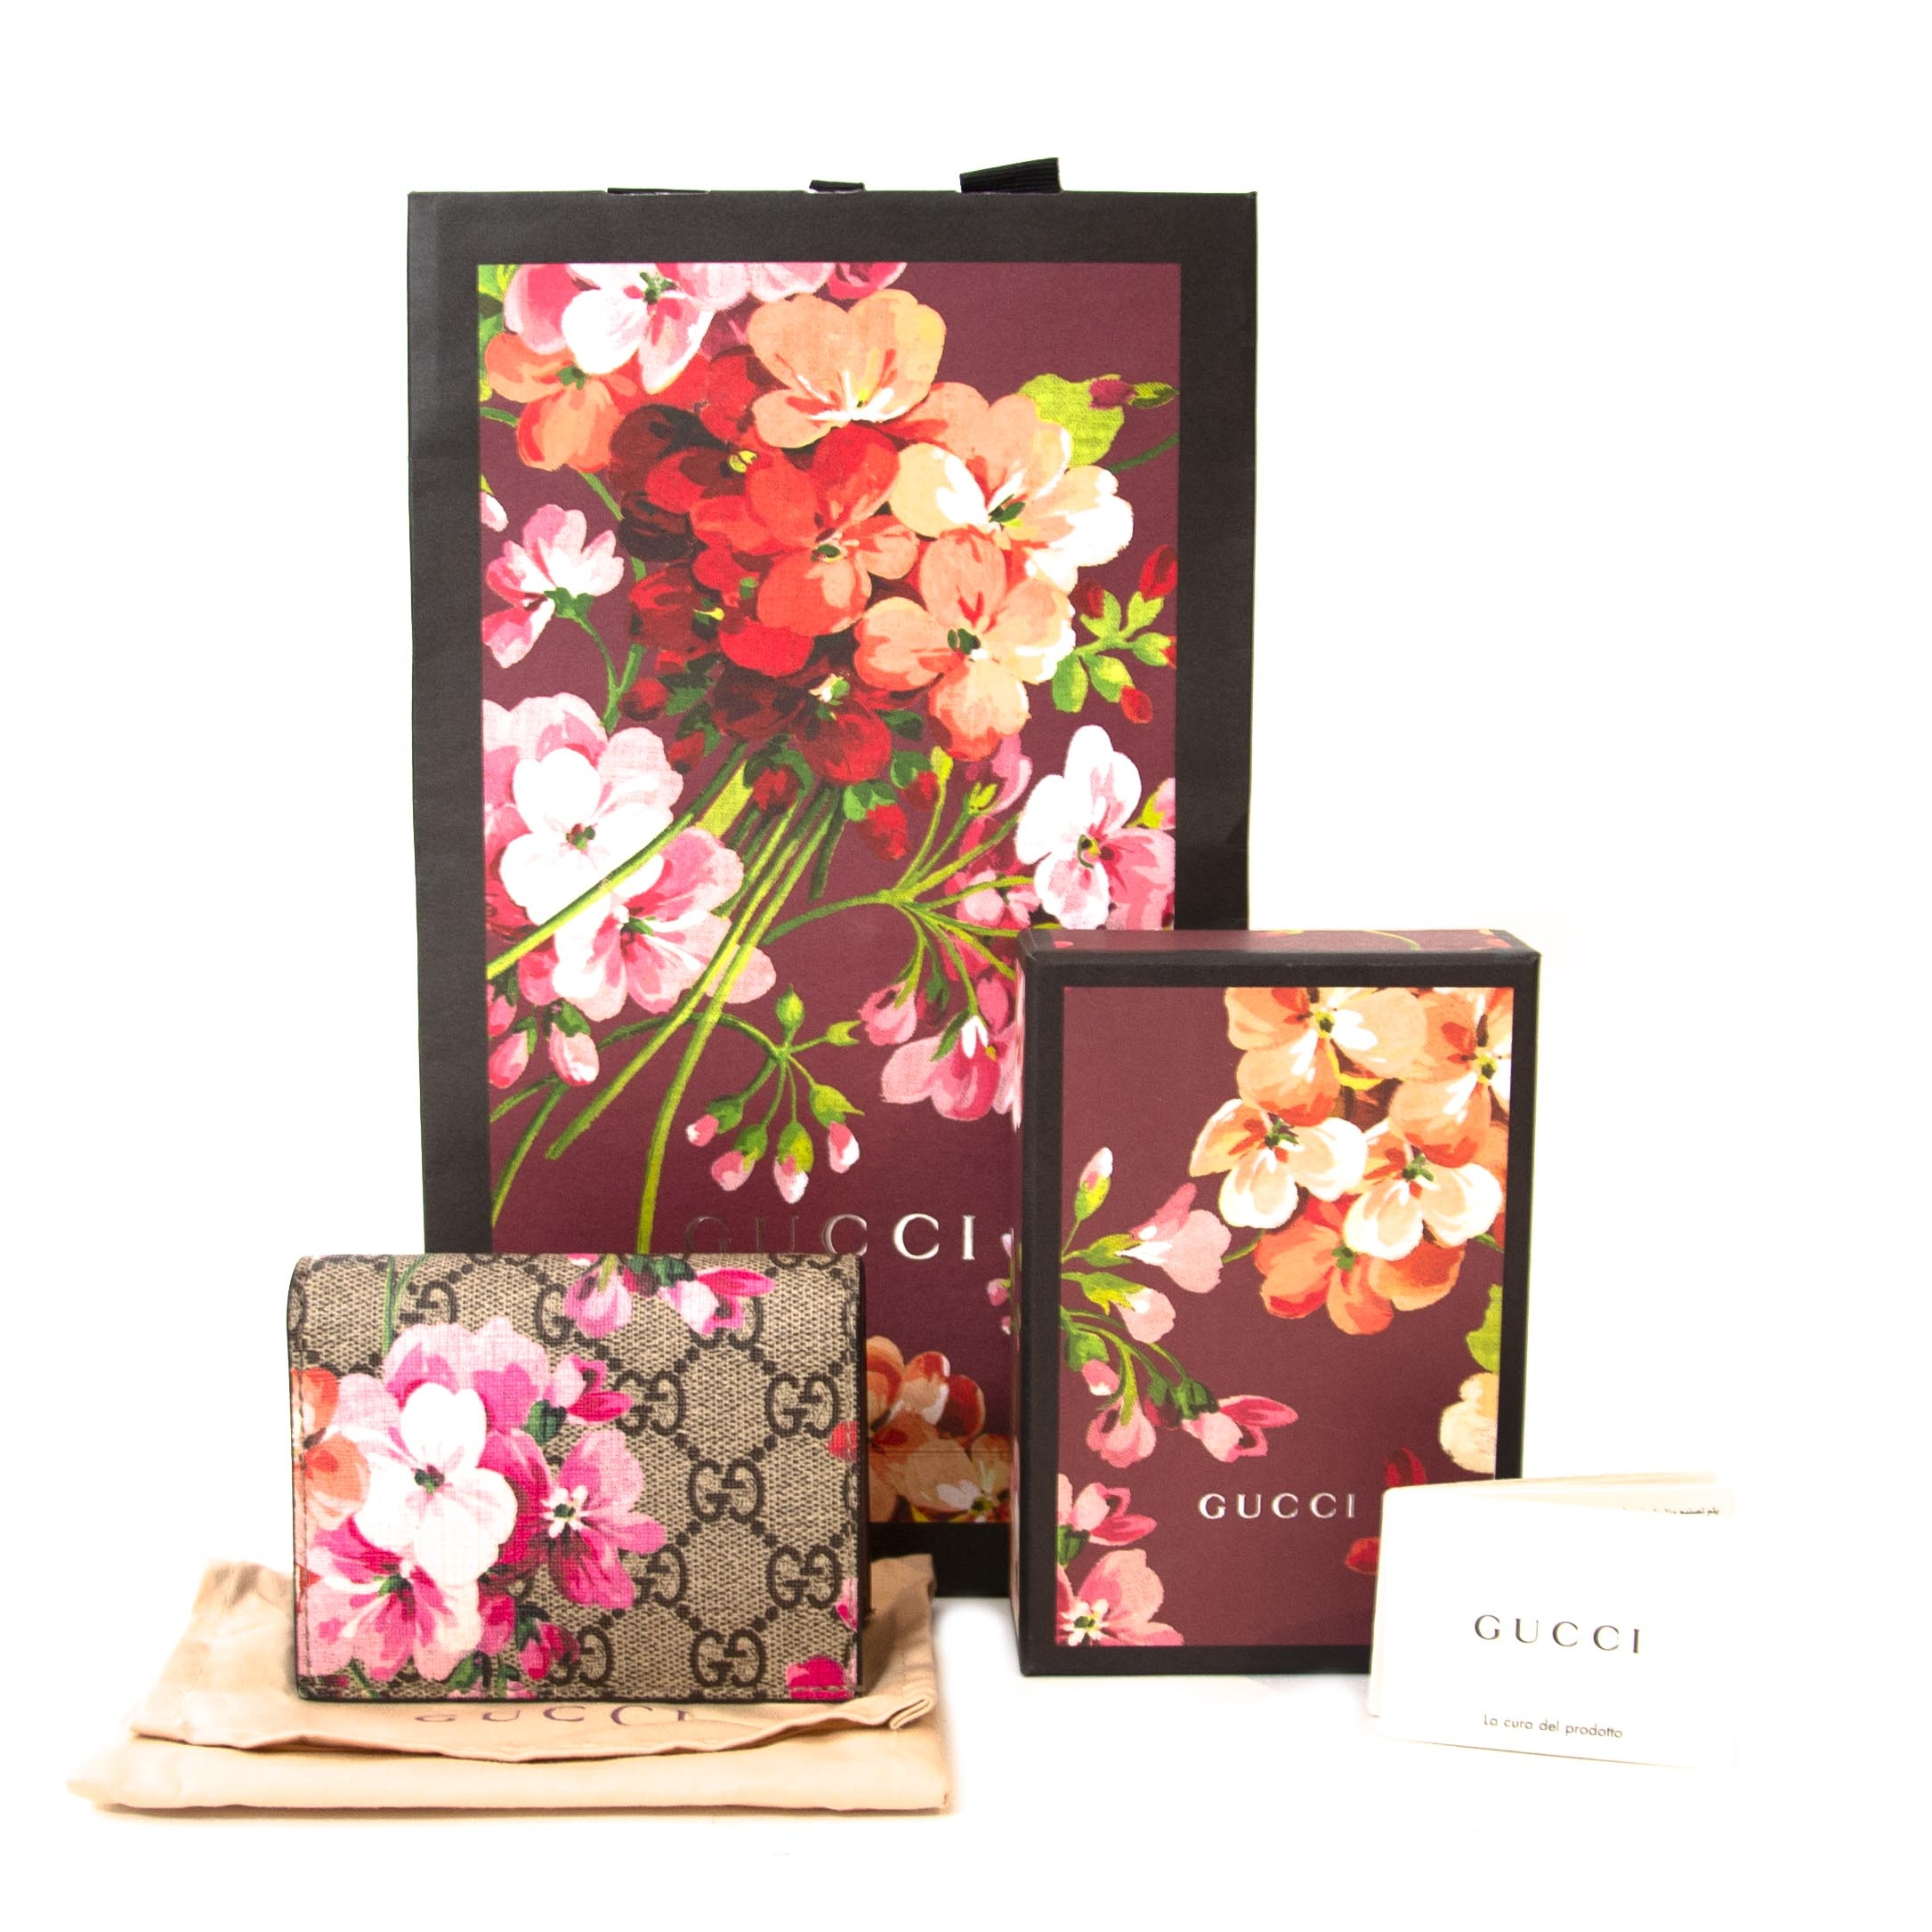 Gucci Supreme Monogram GG Blooms Print Card Case